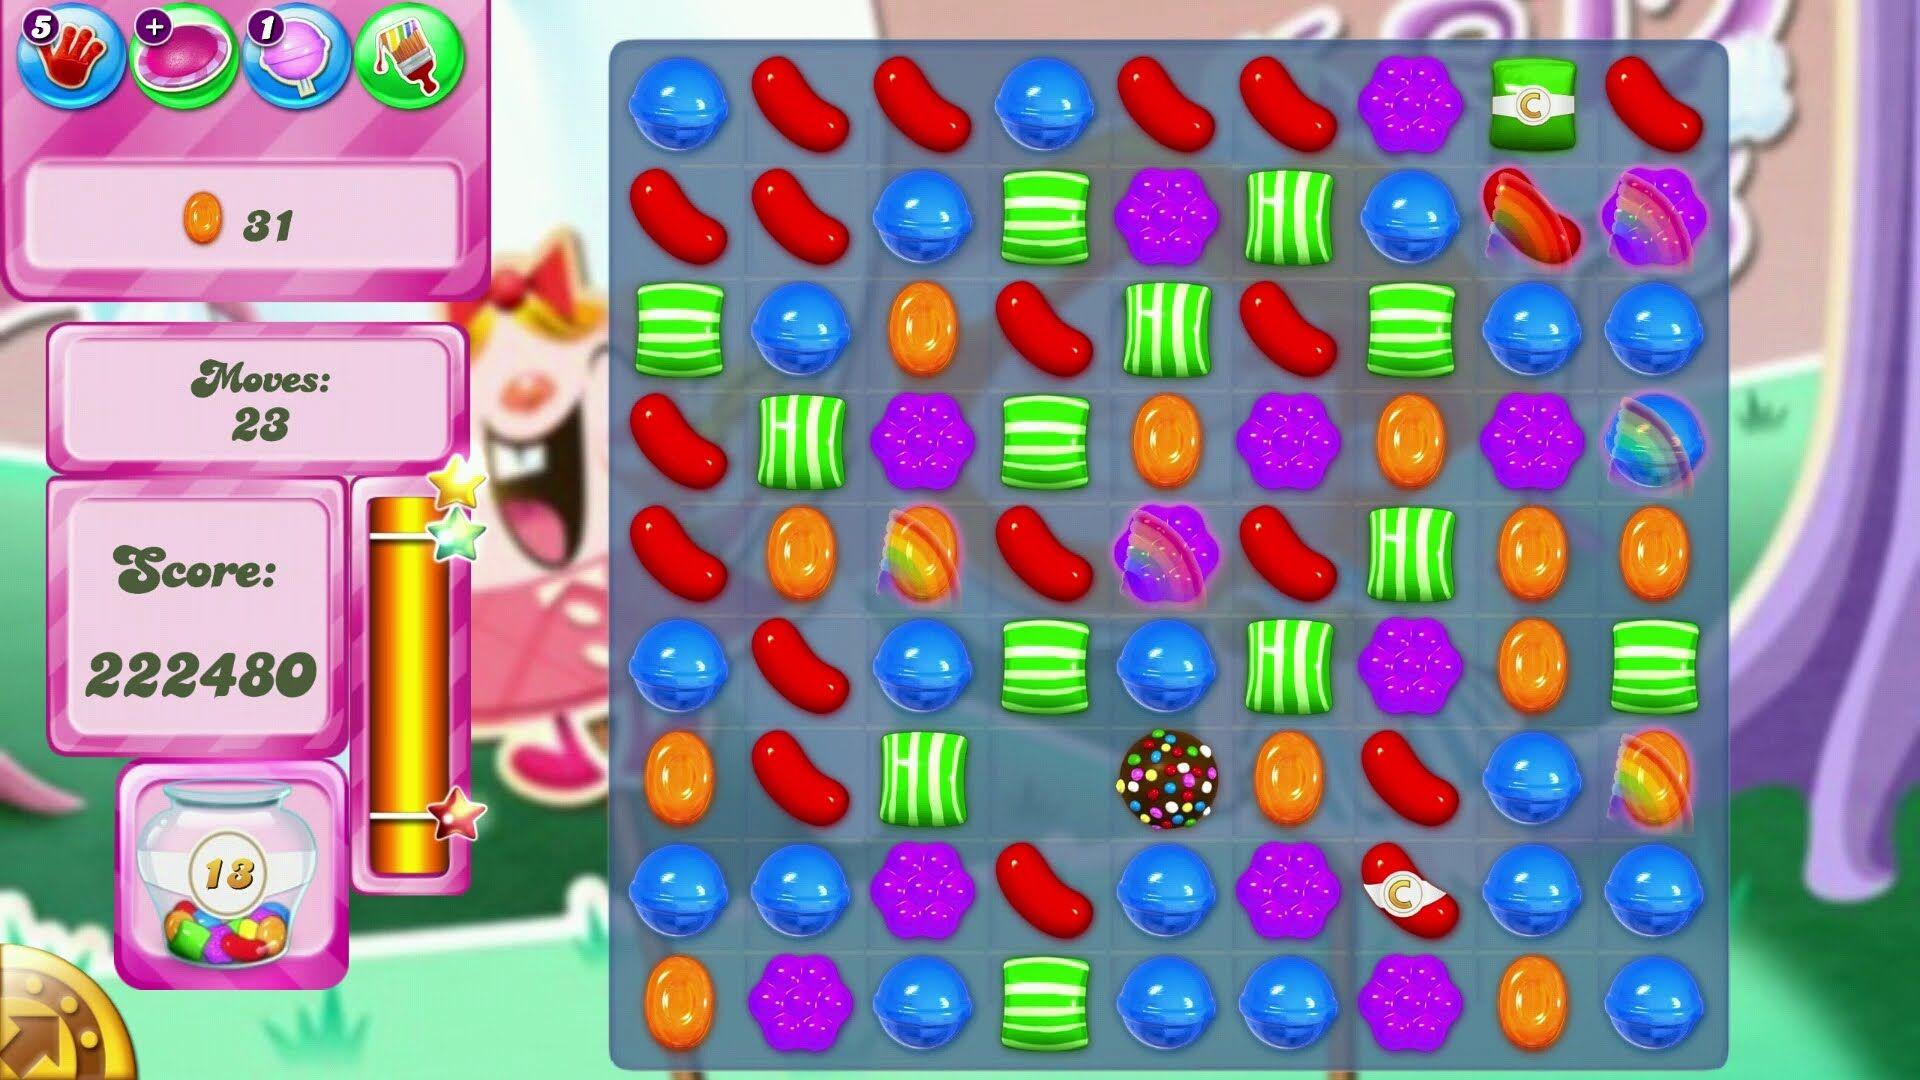 Candy Crush Saga Android Gameplay Candy crush saga